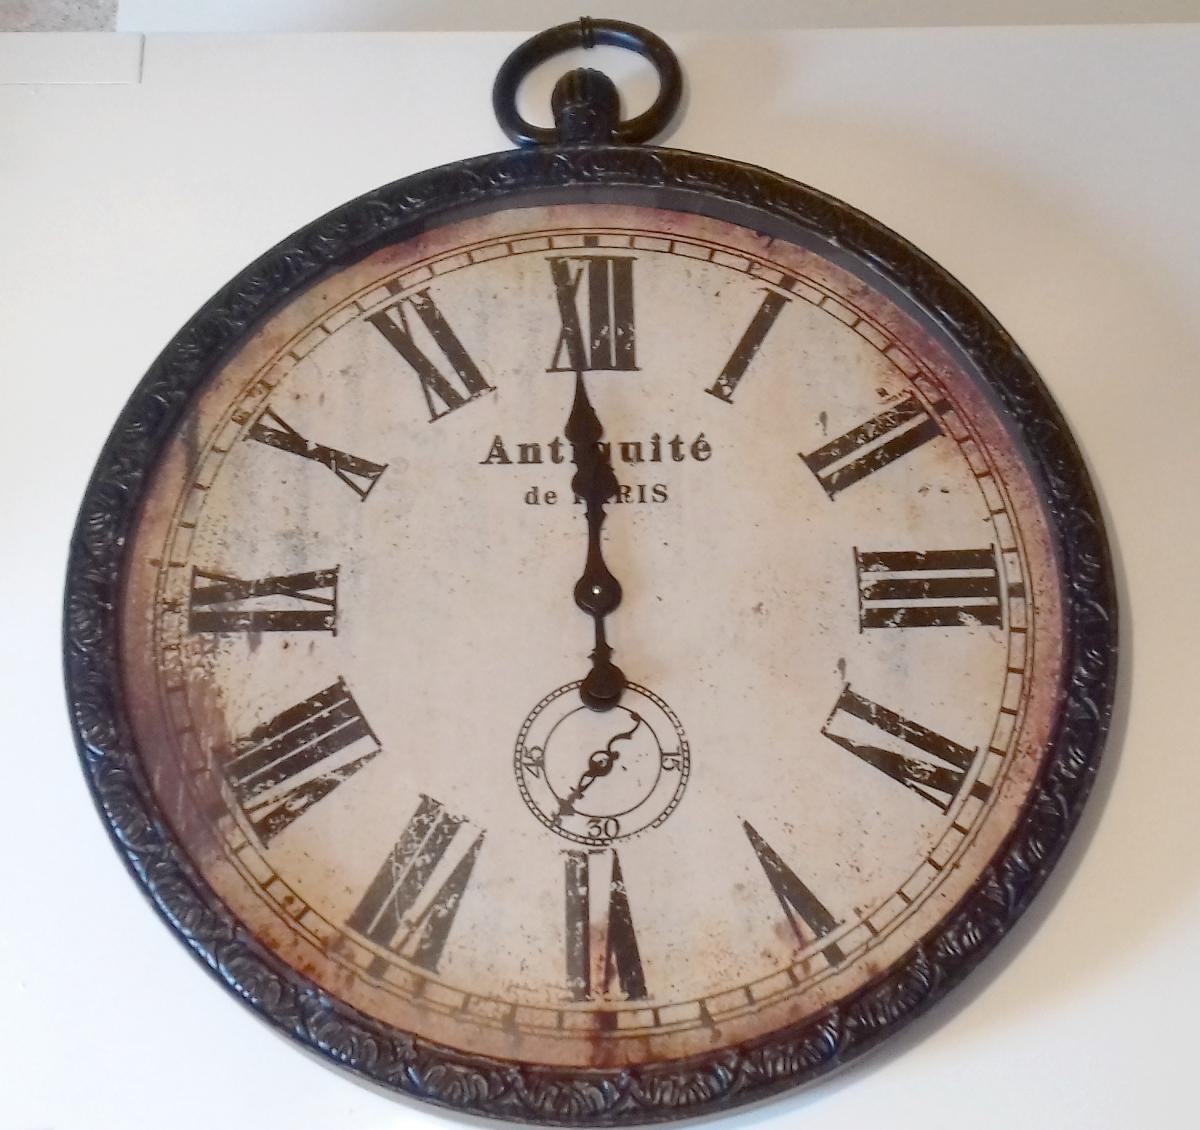 Horloge murale montre gousset luckyfind - Horloge gousset murale ...